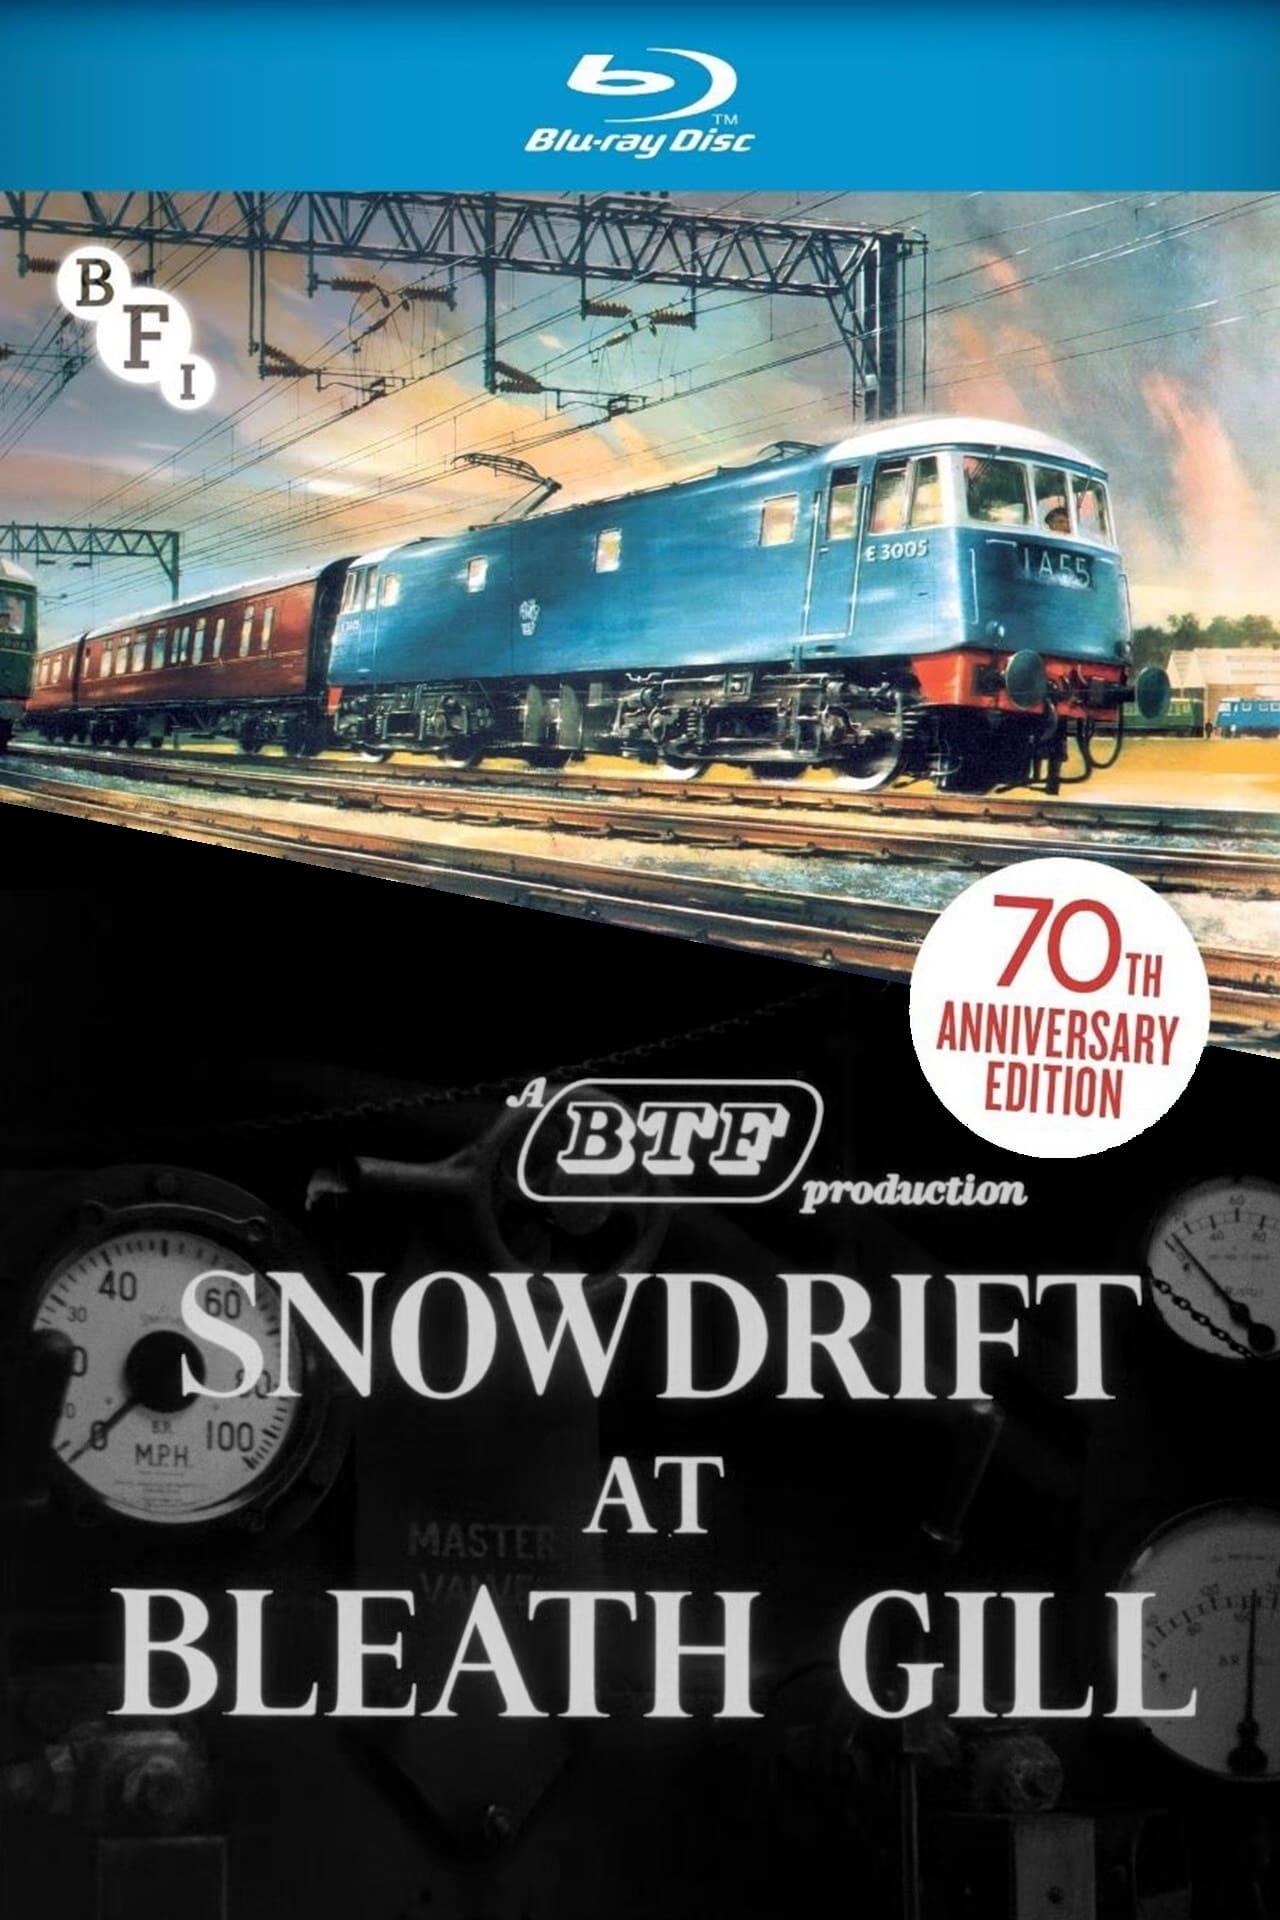 Snowdrift at Bleath Gill